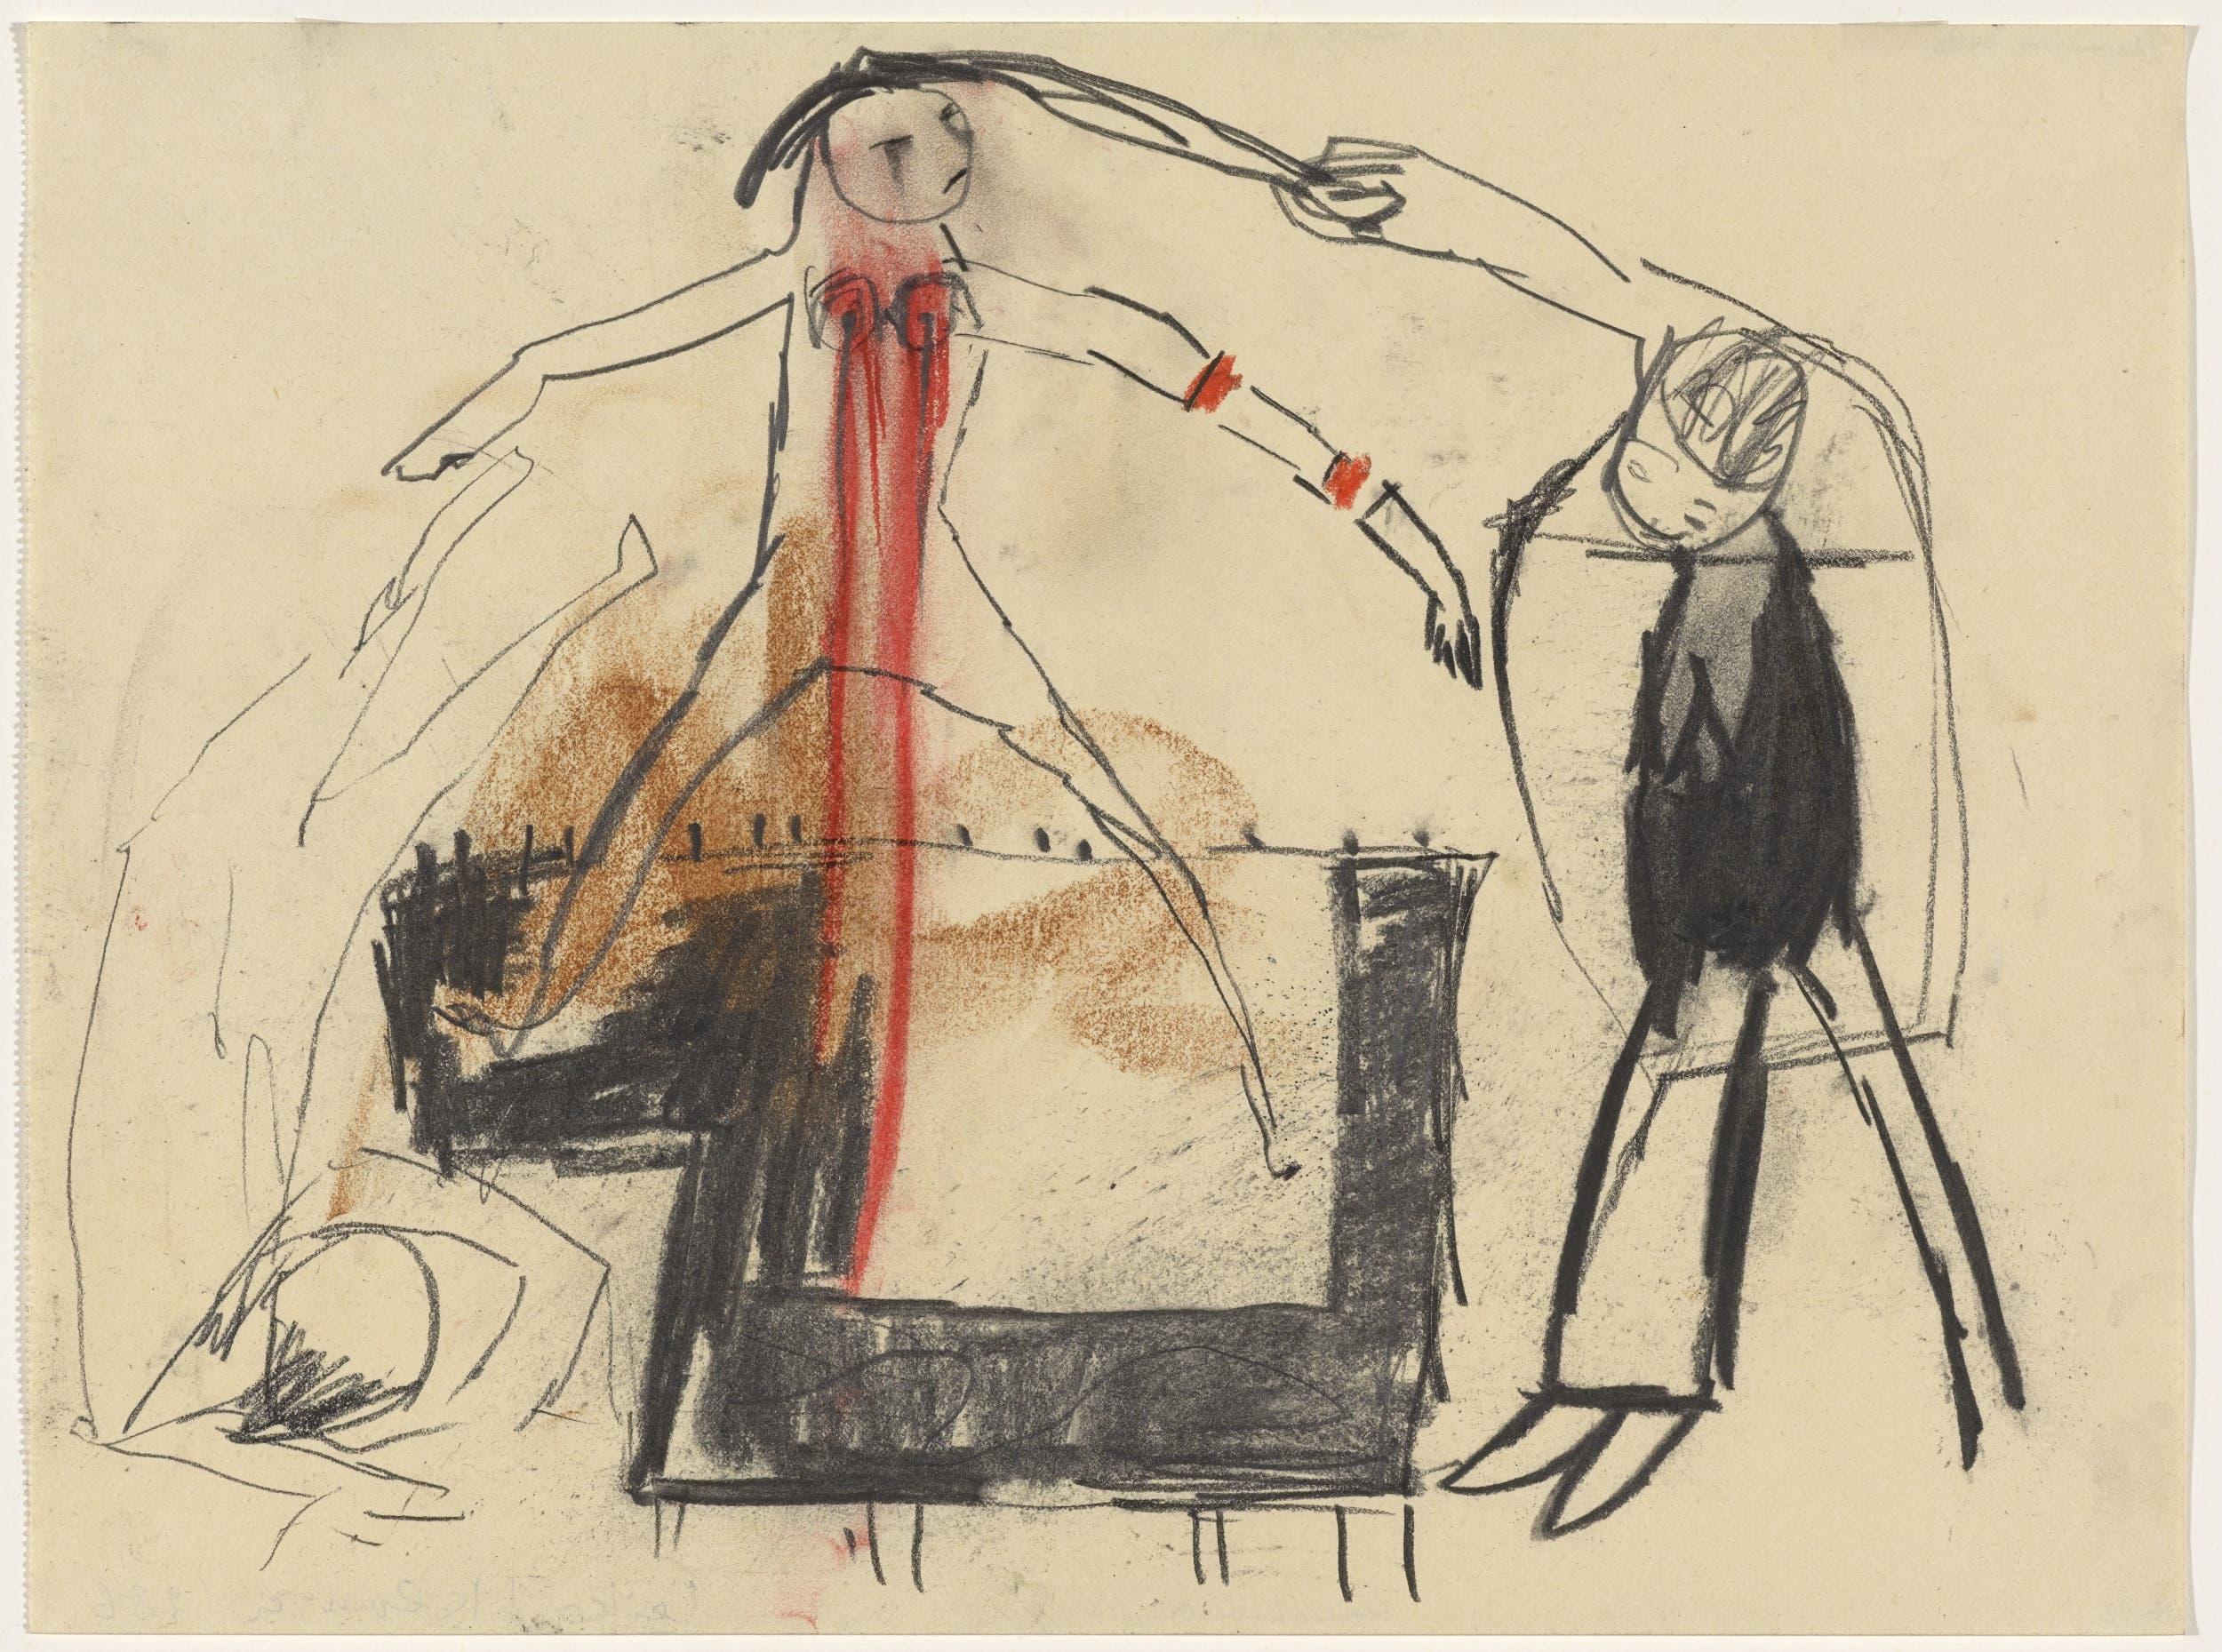 Leiko Ikemura 29.9 x 39.9 cm; Kohle, Bleistift und Farbstift auf Papier Leiko Ikemura Kunstmuseum Basel